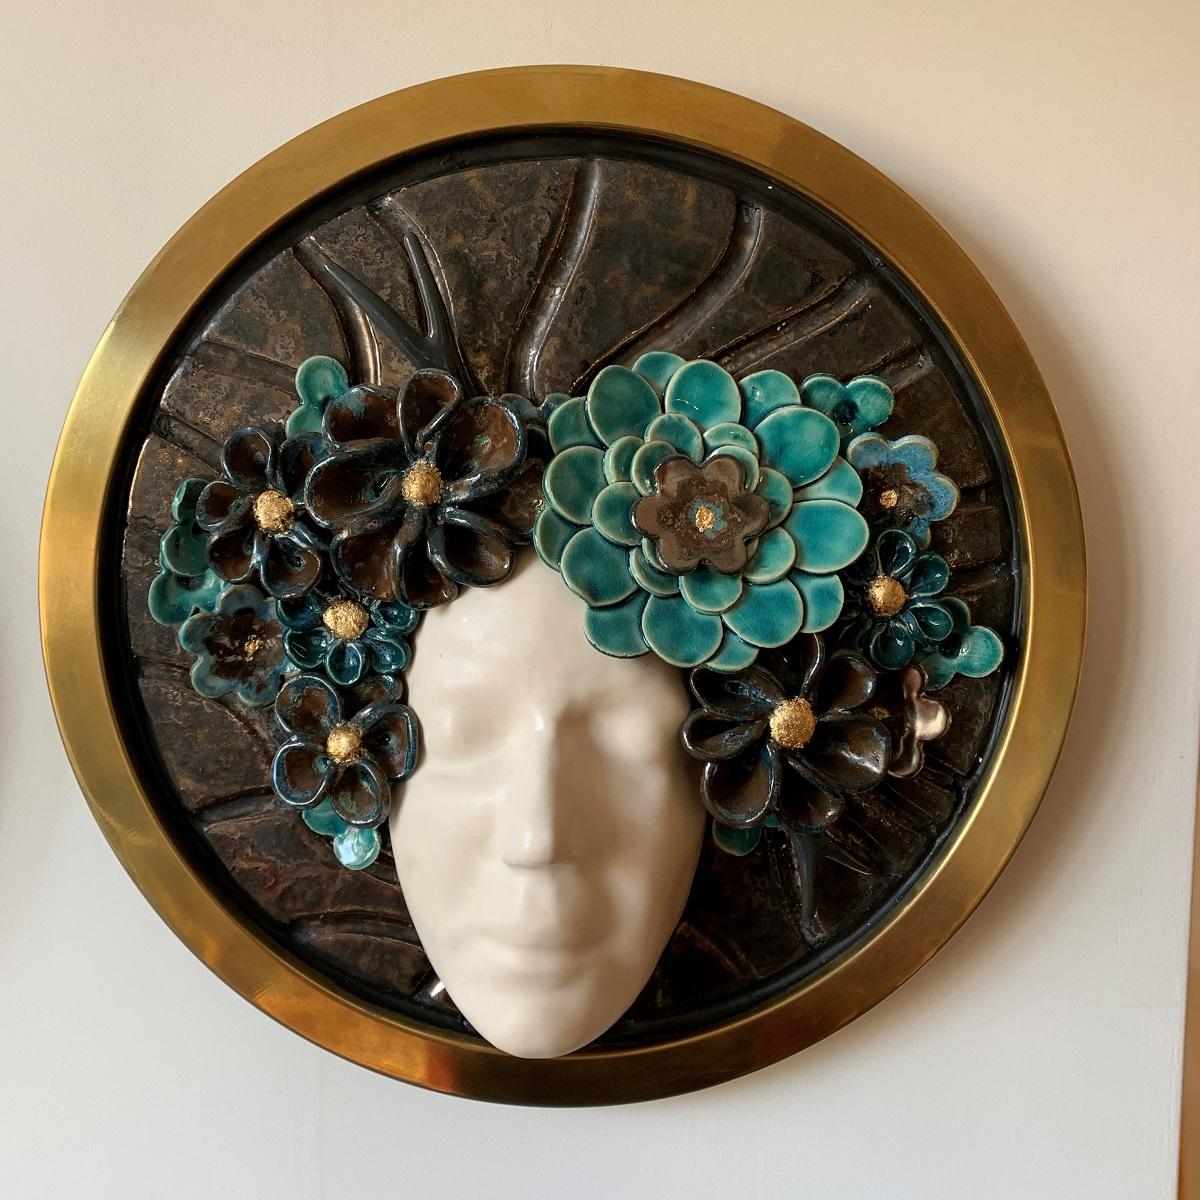 Flowergirl 1 - Maureen Heijdemann - Glasvaardig